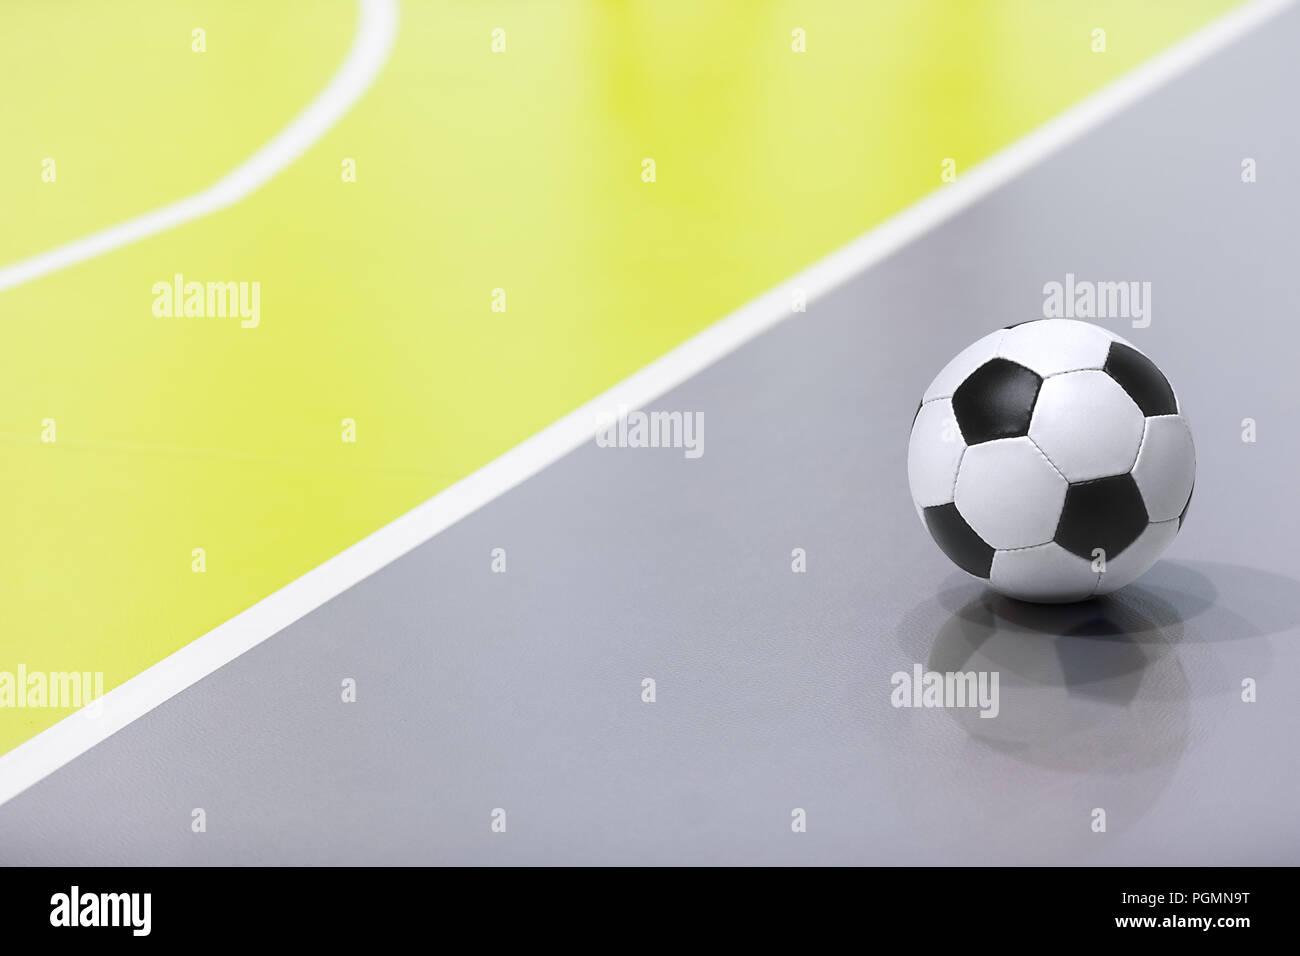 Antecedentes de futsal. Futsal fútbol balón. Partido de fútbol indoor en el  fondo. 4bb602a9929a5